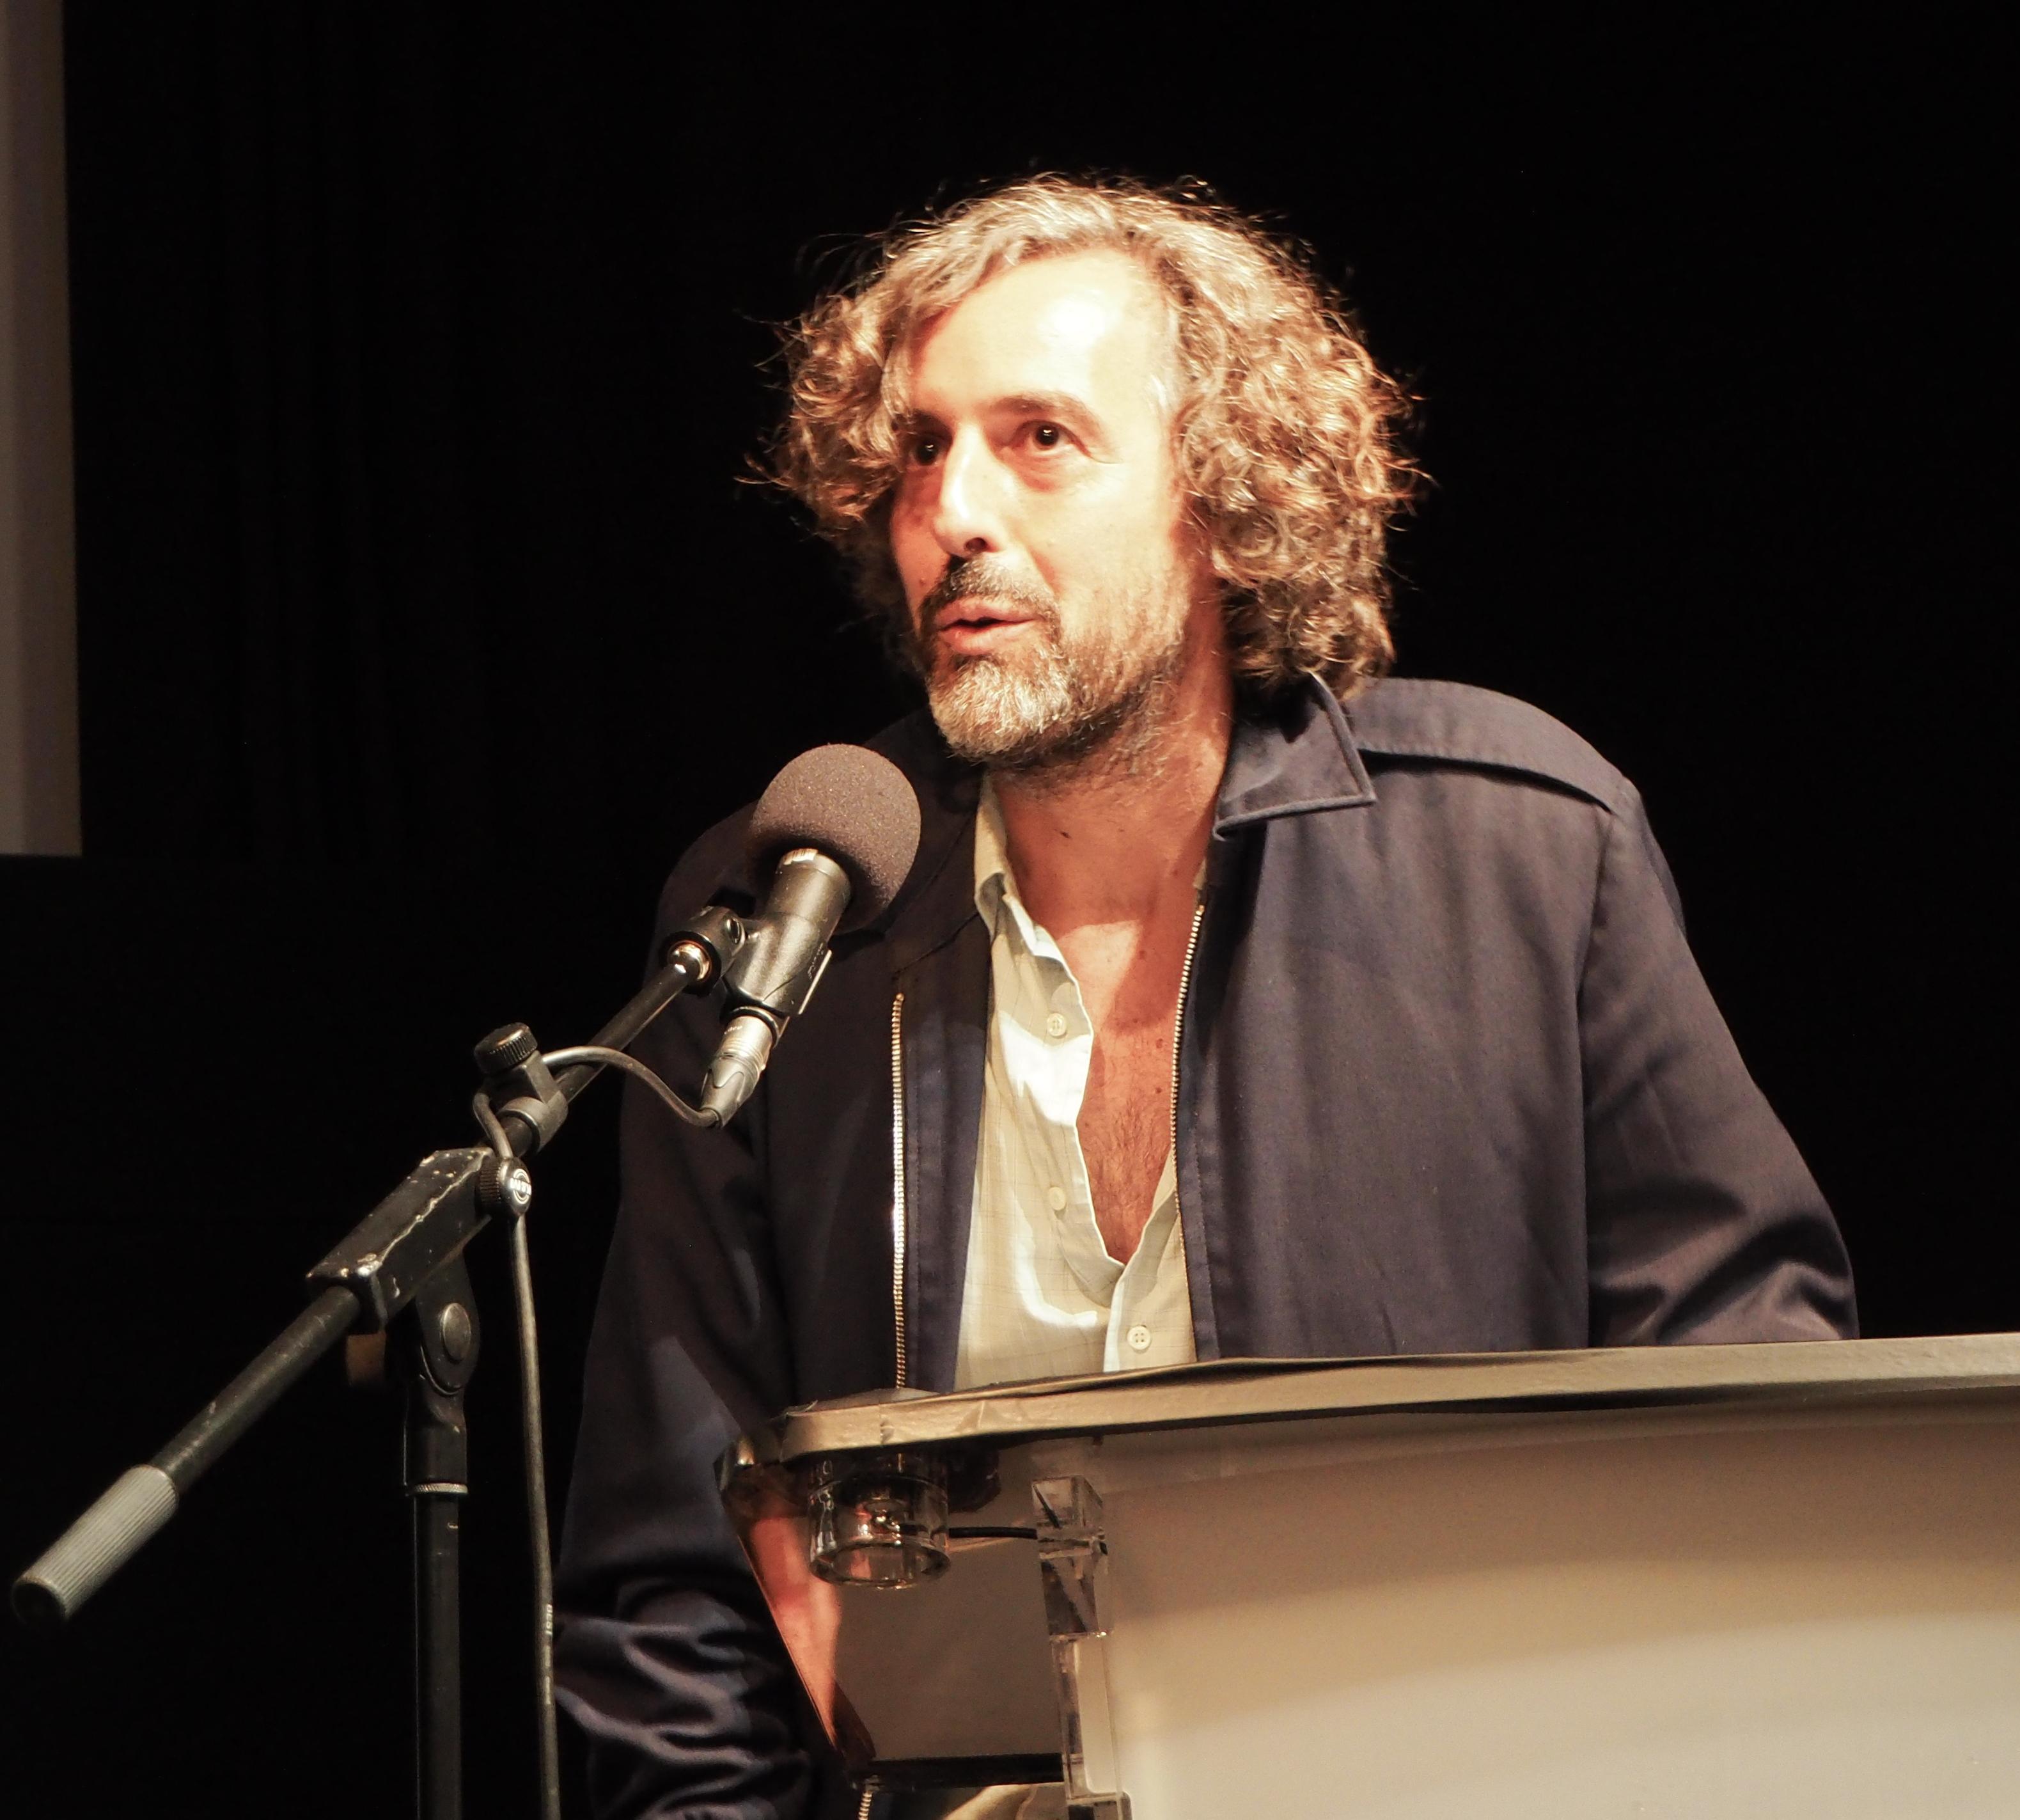 Guillaume Brac Prix Jean Vigo du court métrage 2018 © Alain Keit